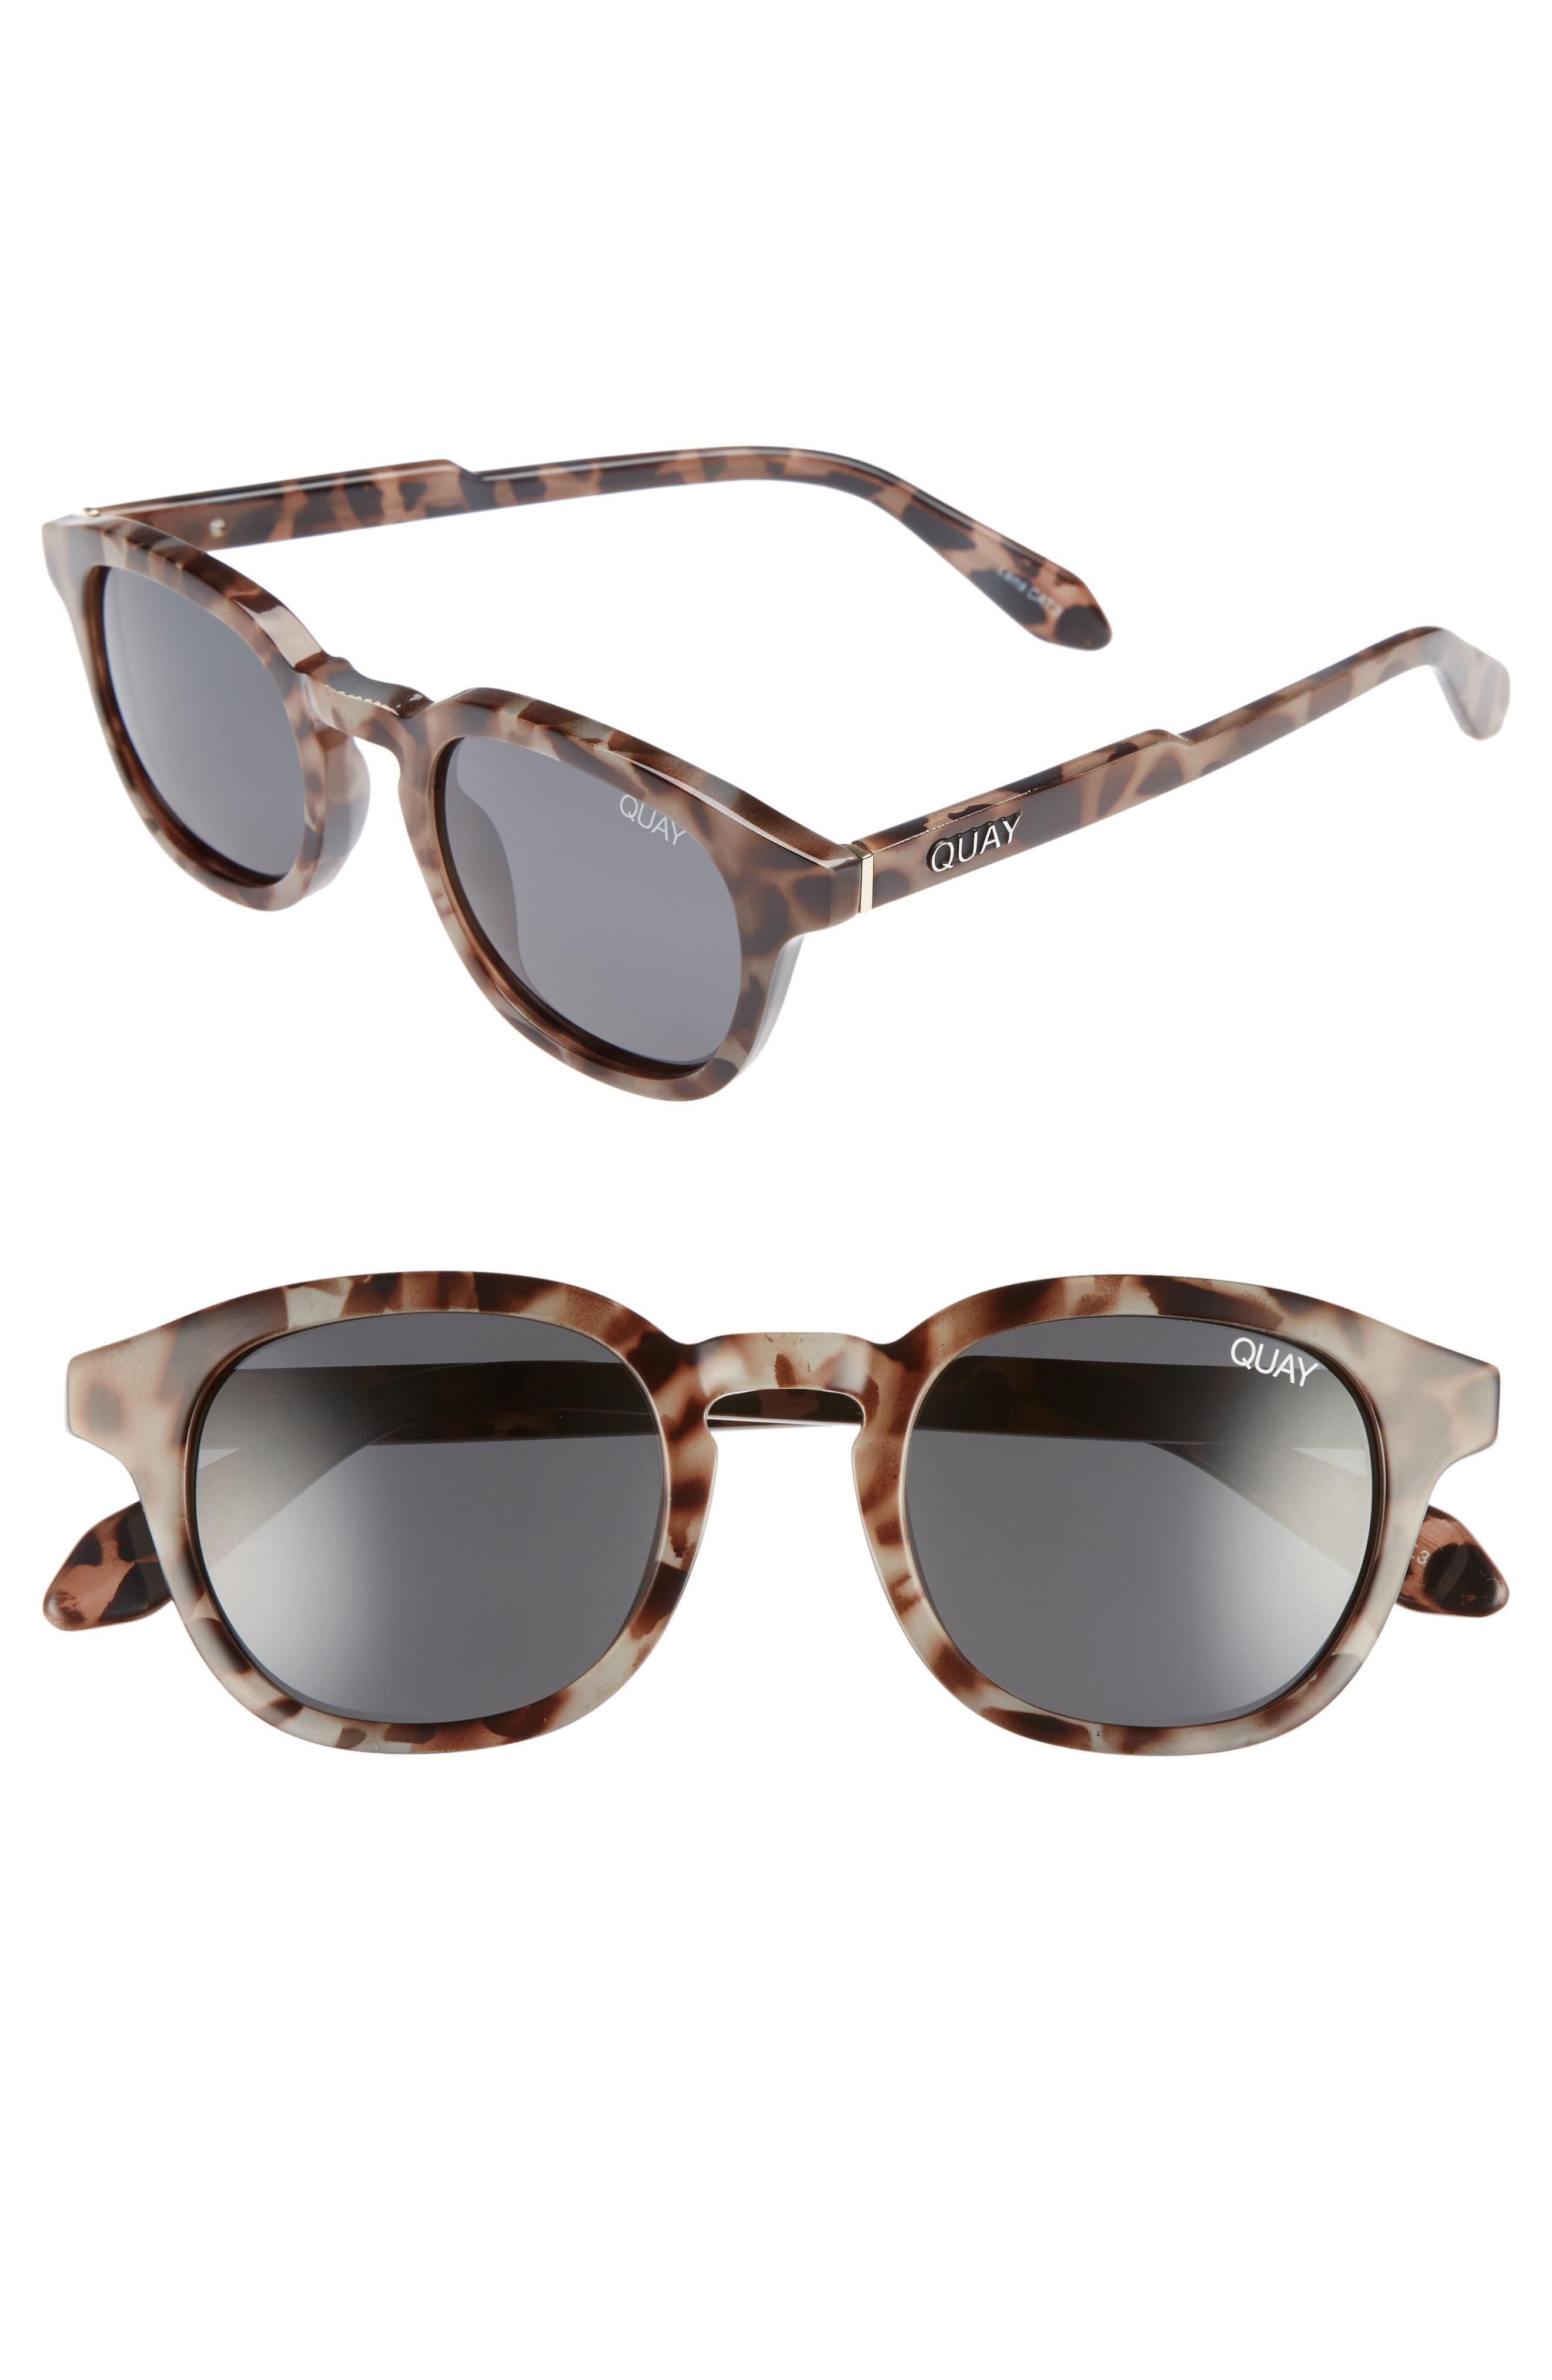 Walk On 47mm Polarized Sunglasses,                             Main thumbnail 1, color,                             Tortoise / Smoke Lens